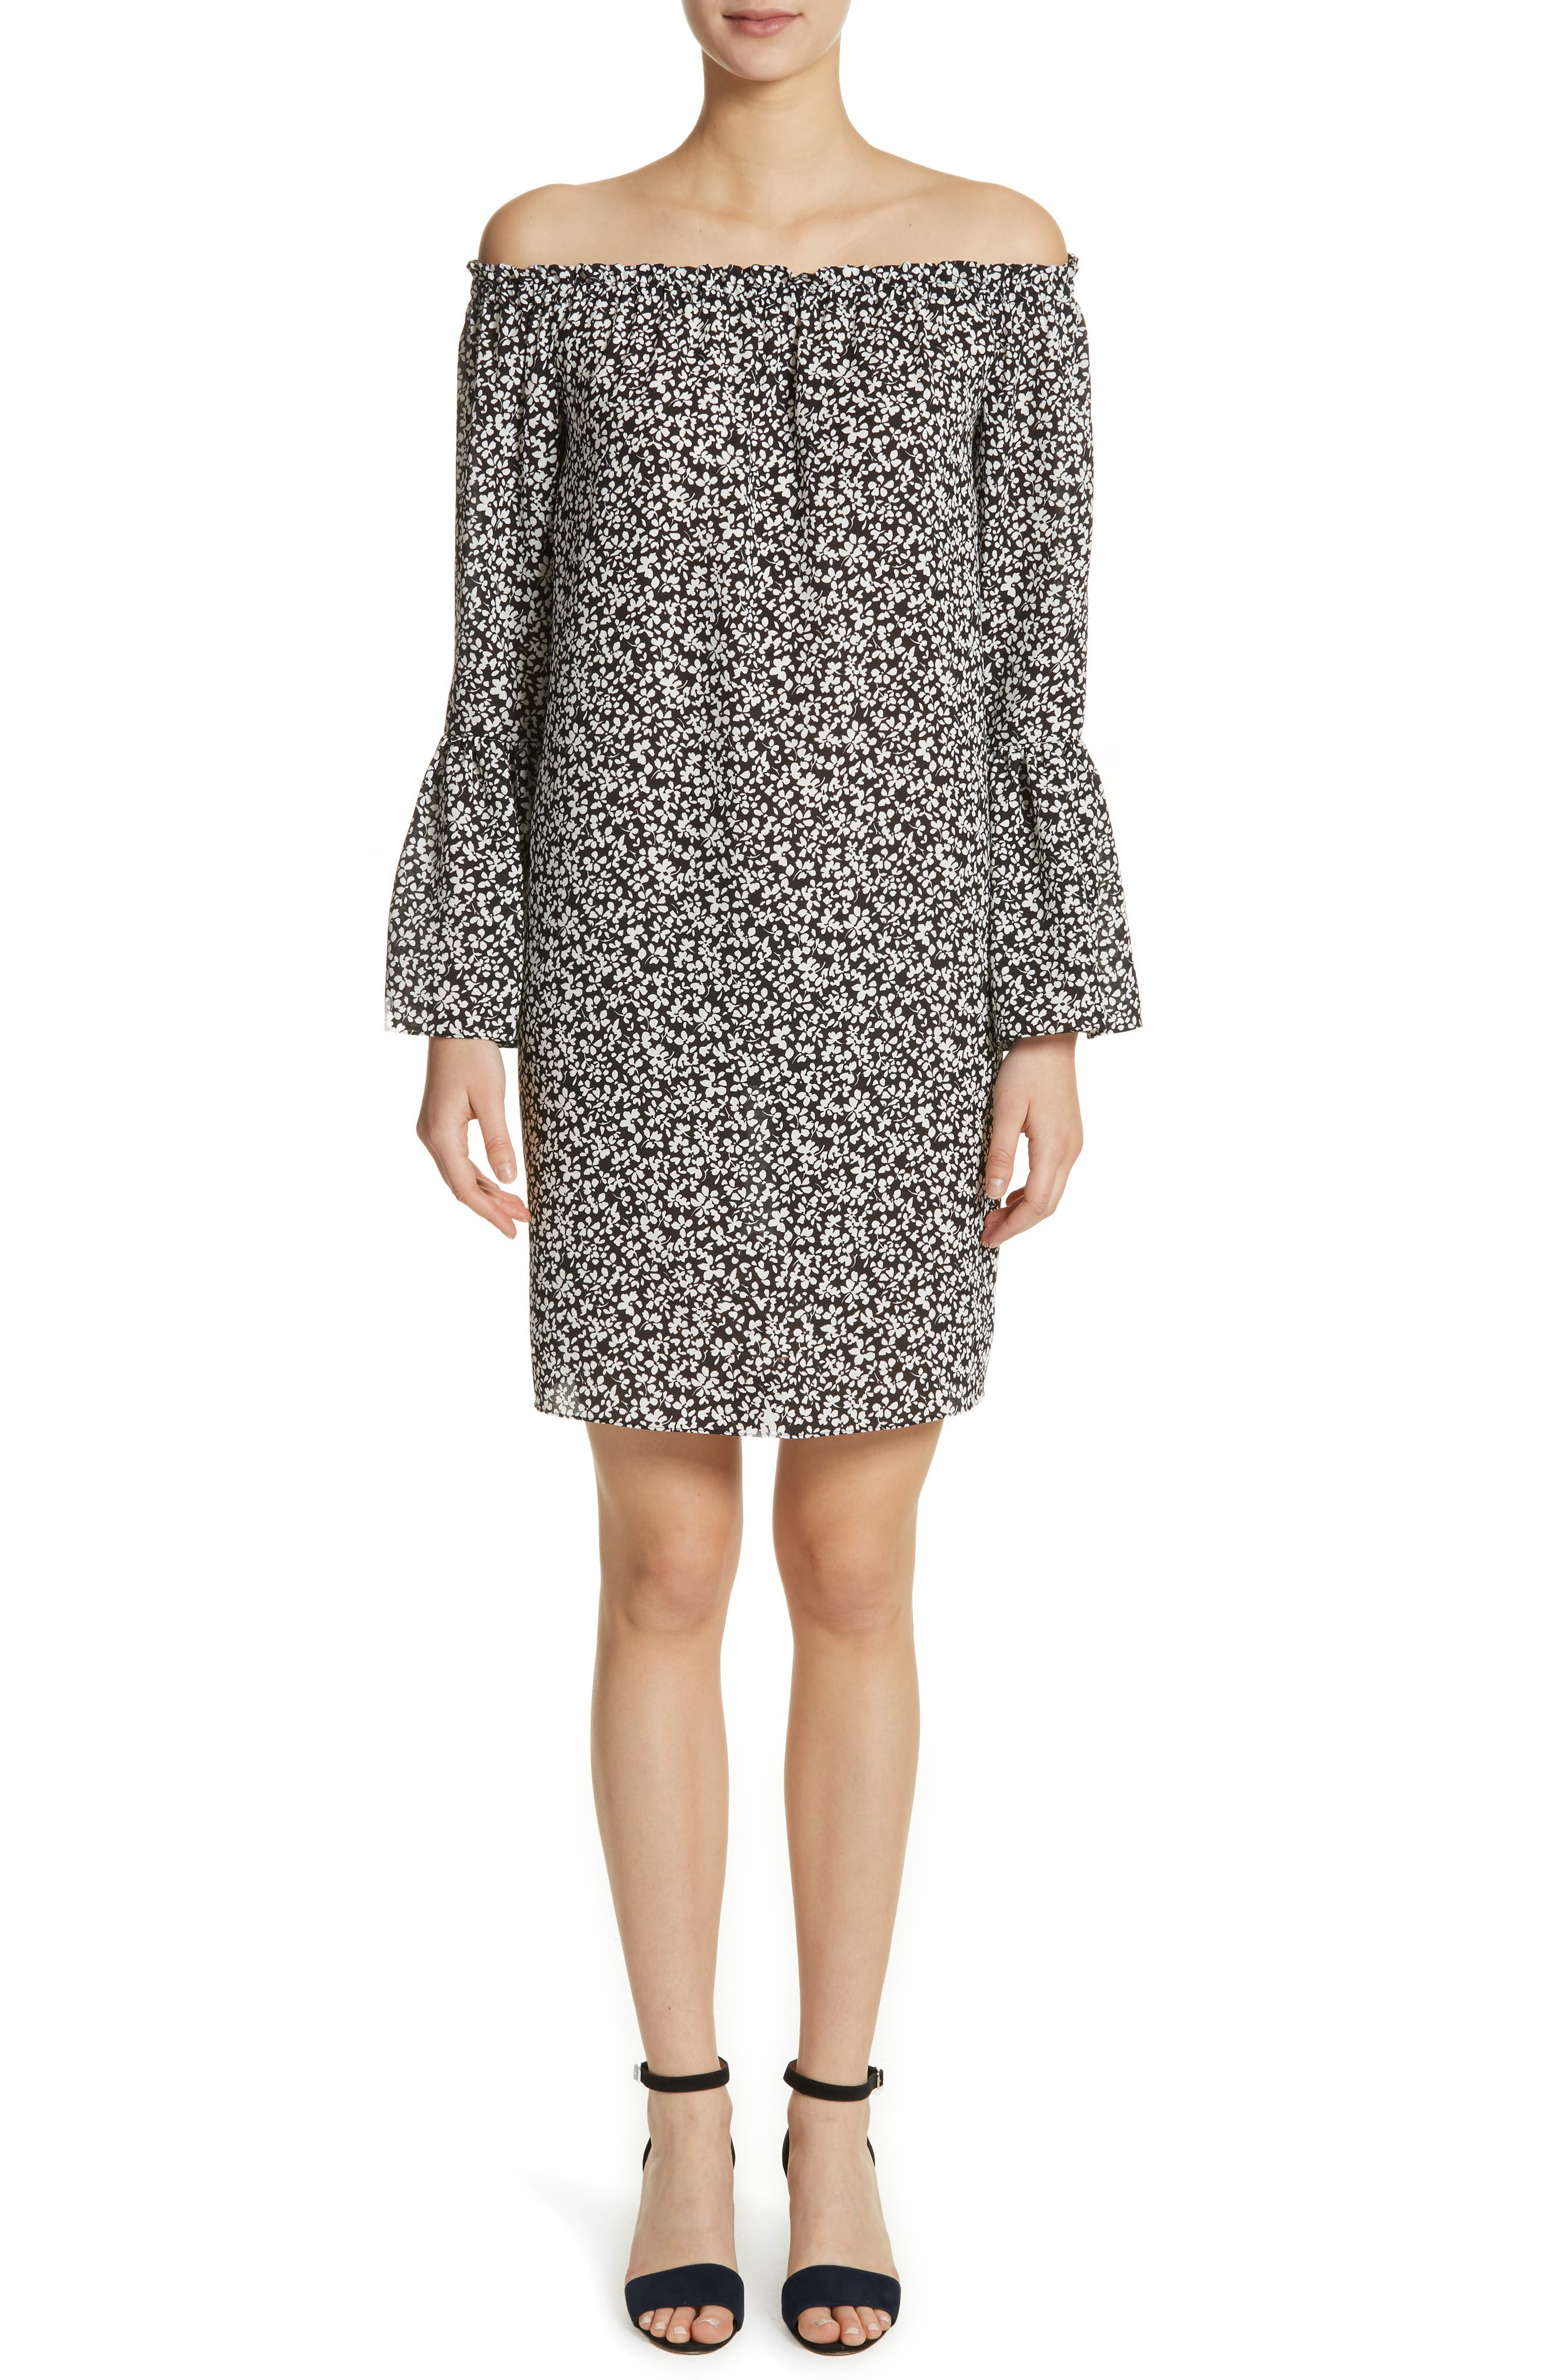 Alternate Image 1 Selected - Michael Kors Print Silk Off the Shoulder Dress